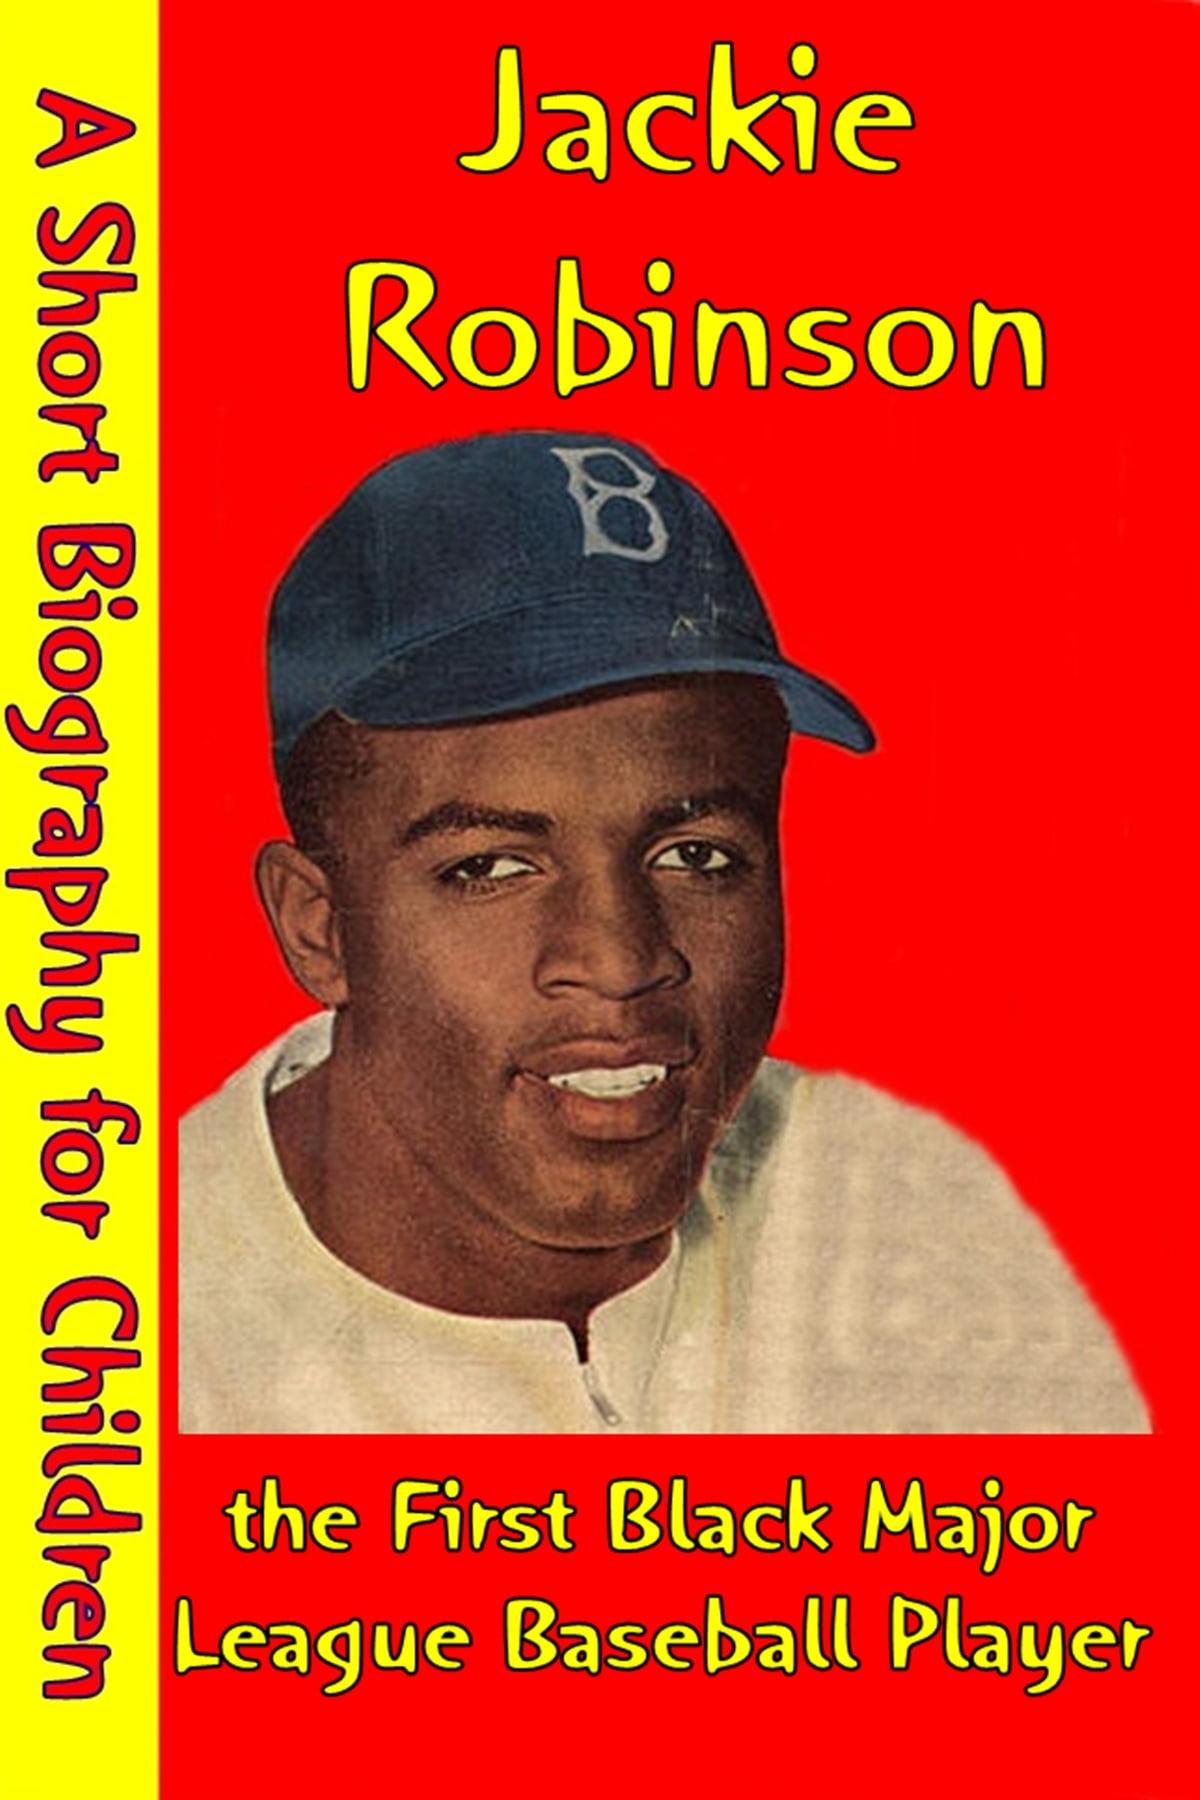 Jackie Robinson The First Black Major League Baseball